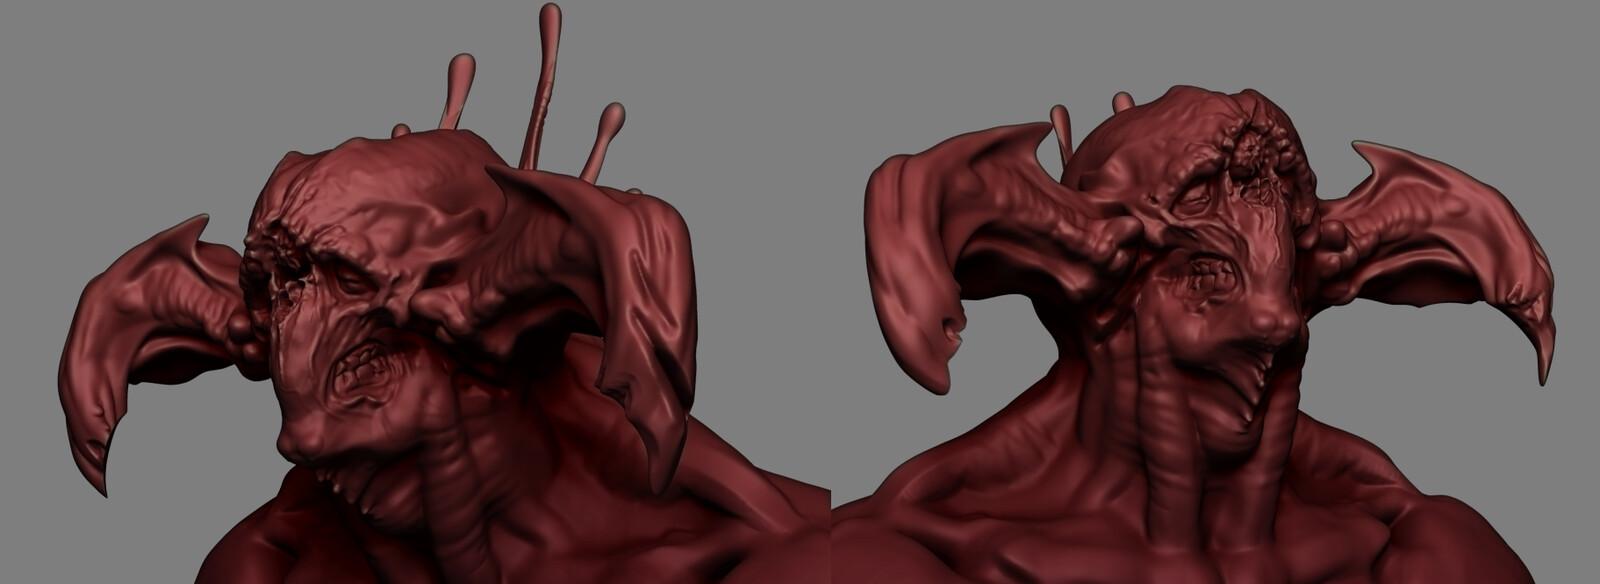 finished sculpt